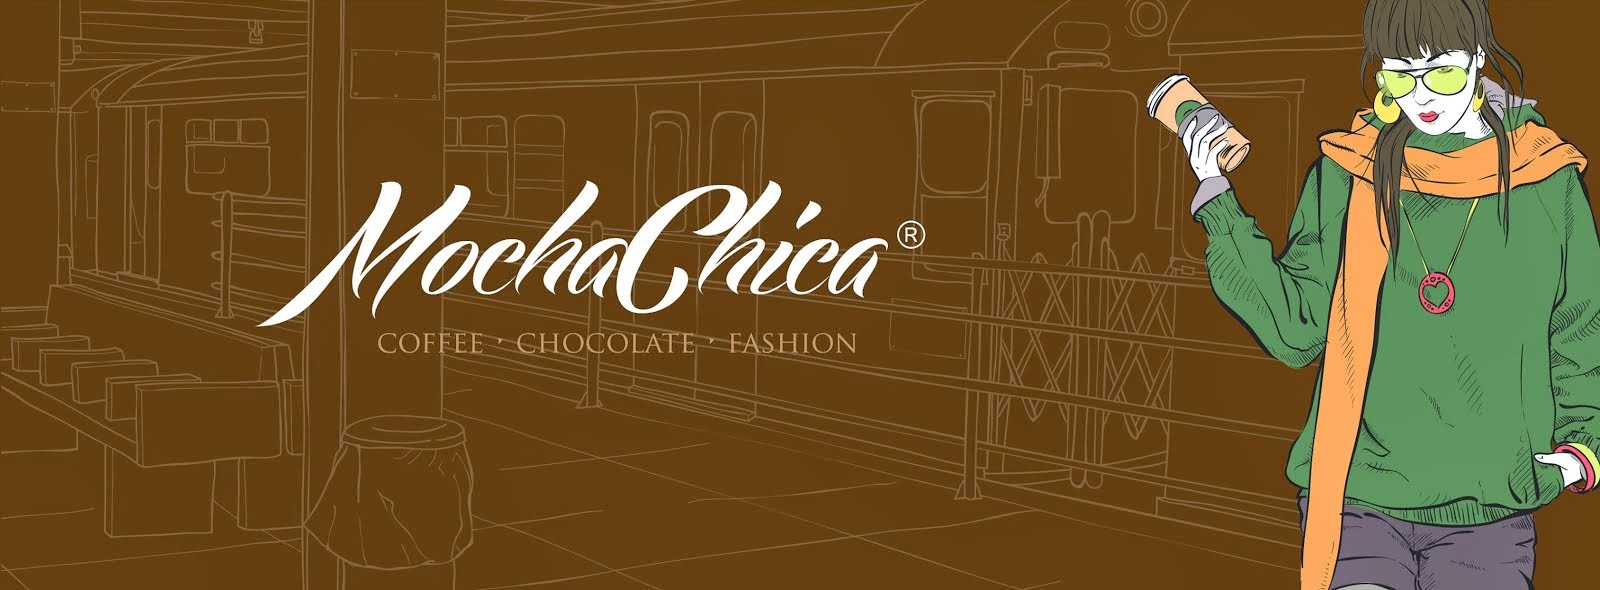 Mocha Chica